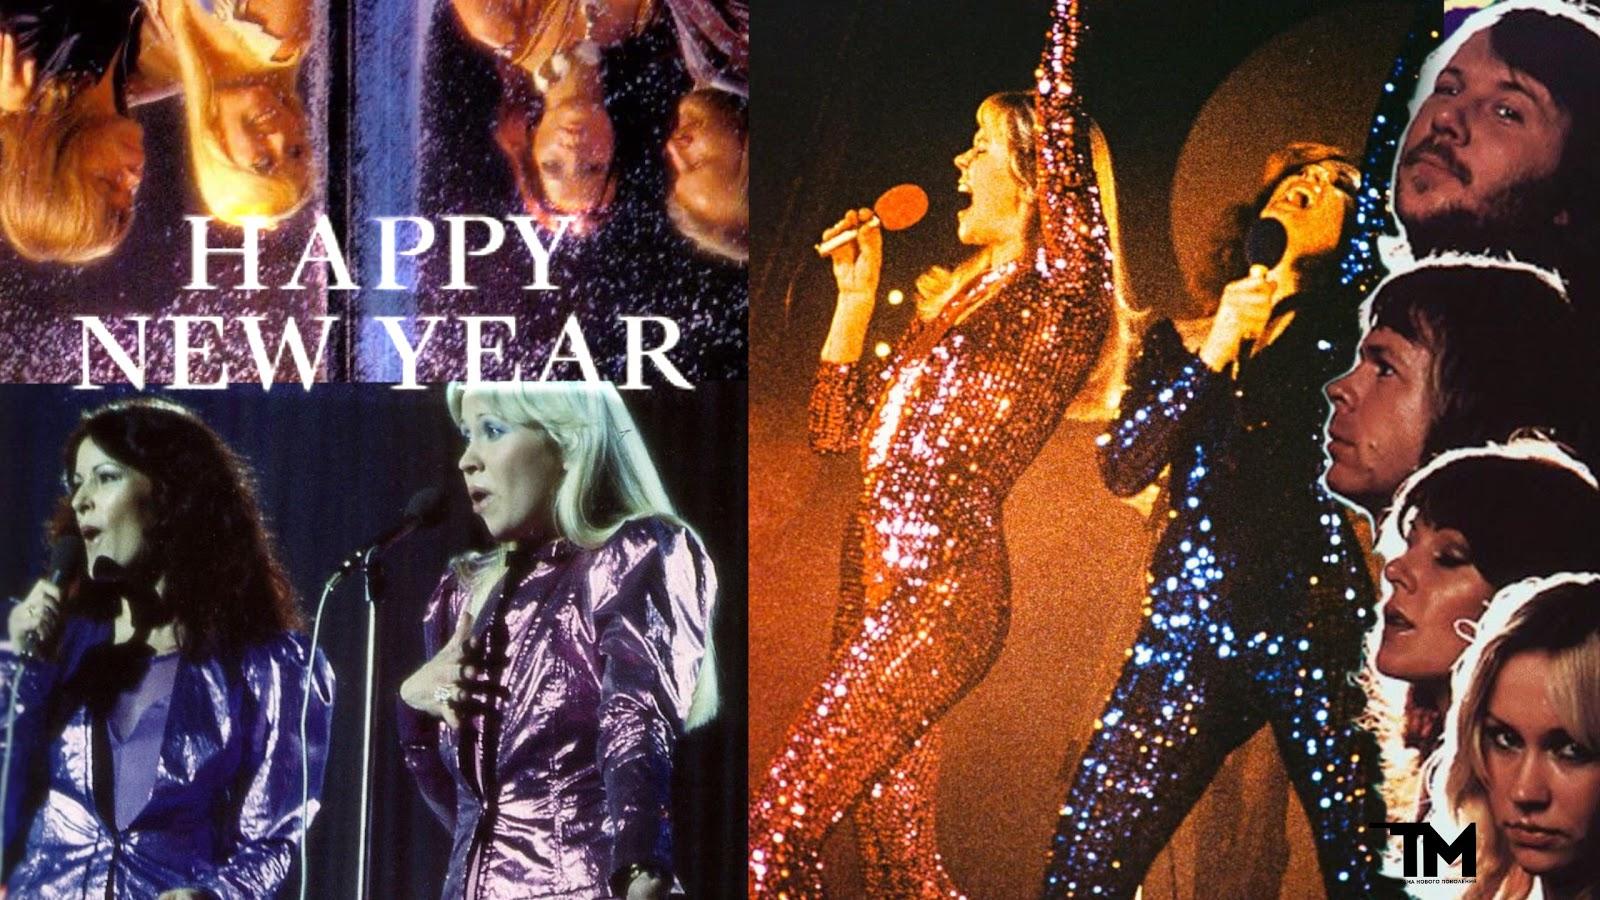 Gimme! Gimme! Gimme! : ABBA и из легендарные образы 70-х